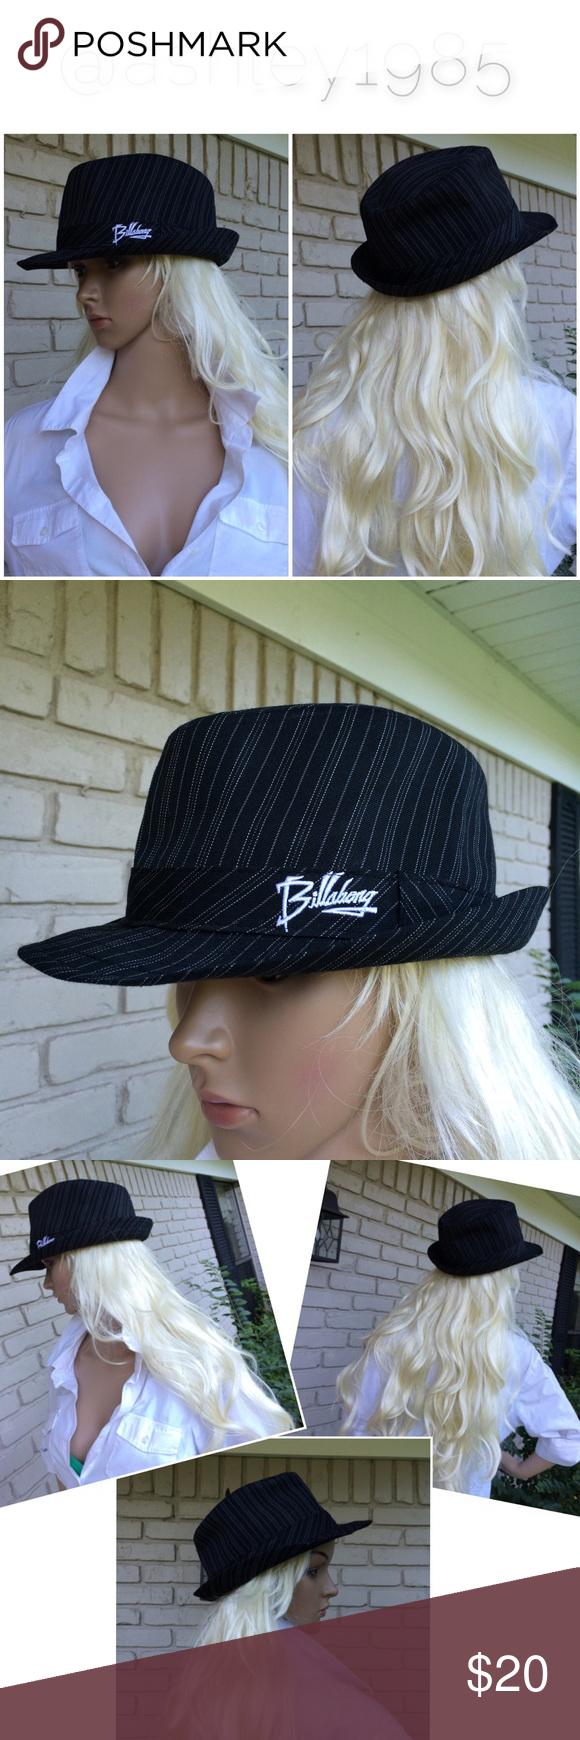 Billabong Black White Pinstripe Fedora Hat Trendy Hat Black Fashion Pinstripe